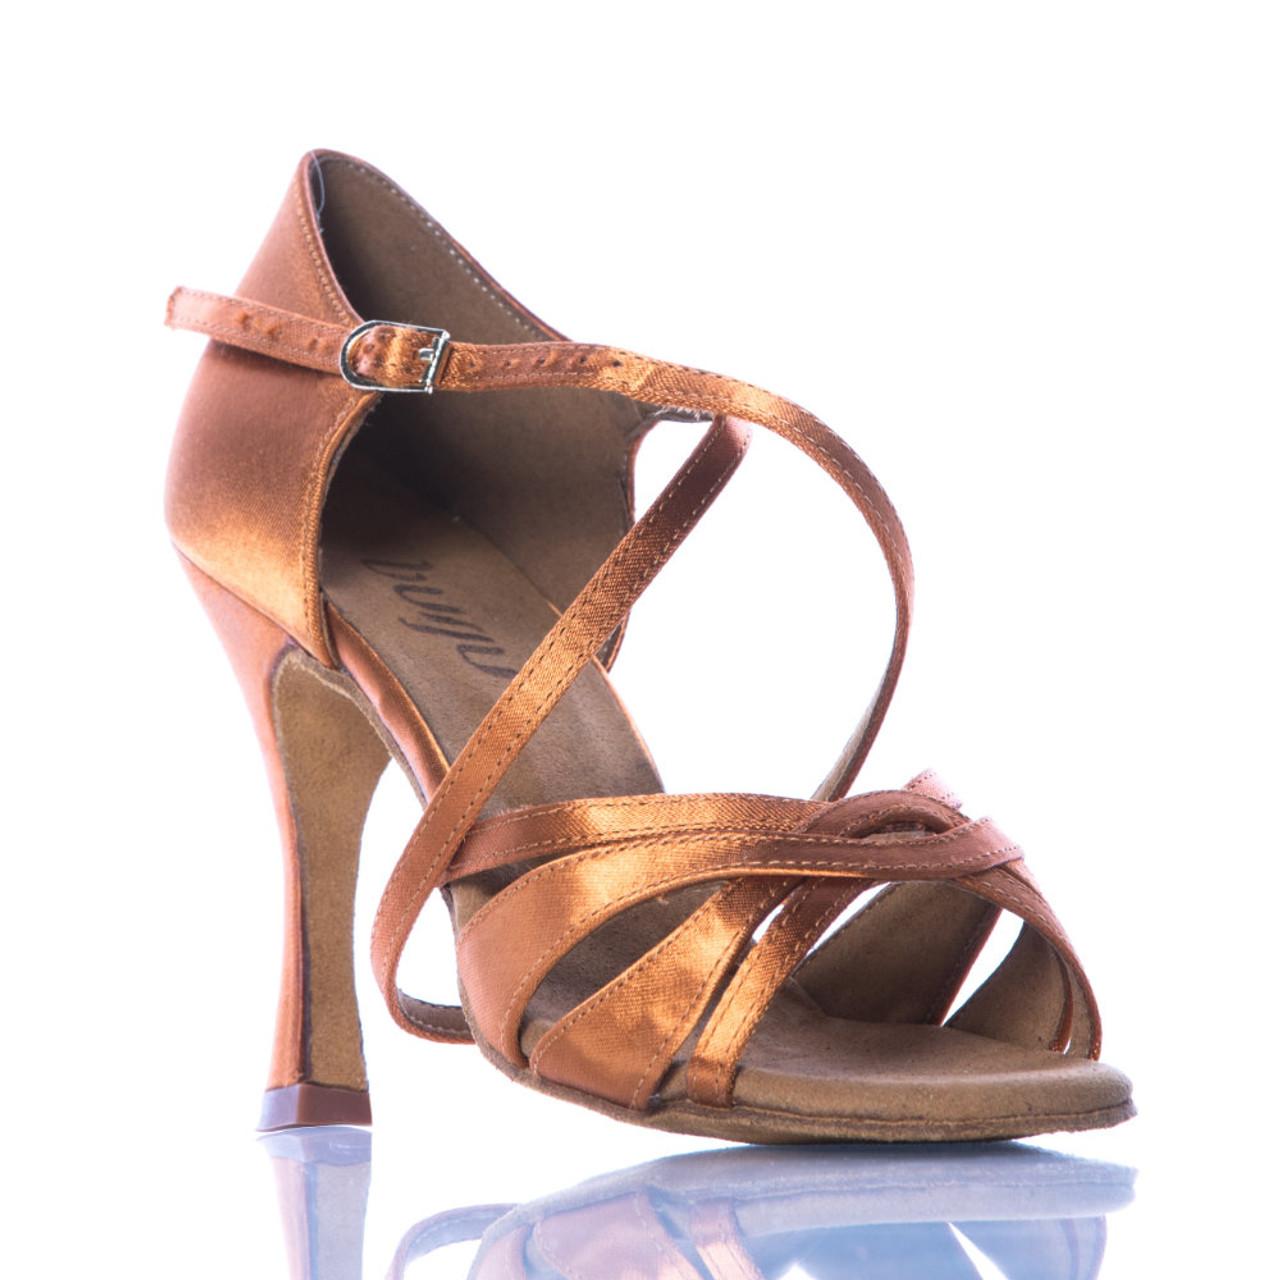 3b056dfd529 Loraina - Nude Strappy Dance Shoe - 3.75 inch Flared Heels - Burju Shoes